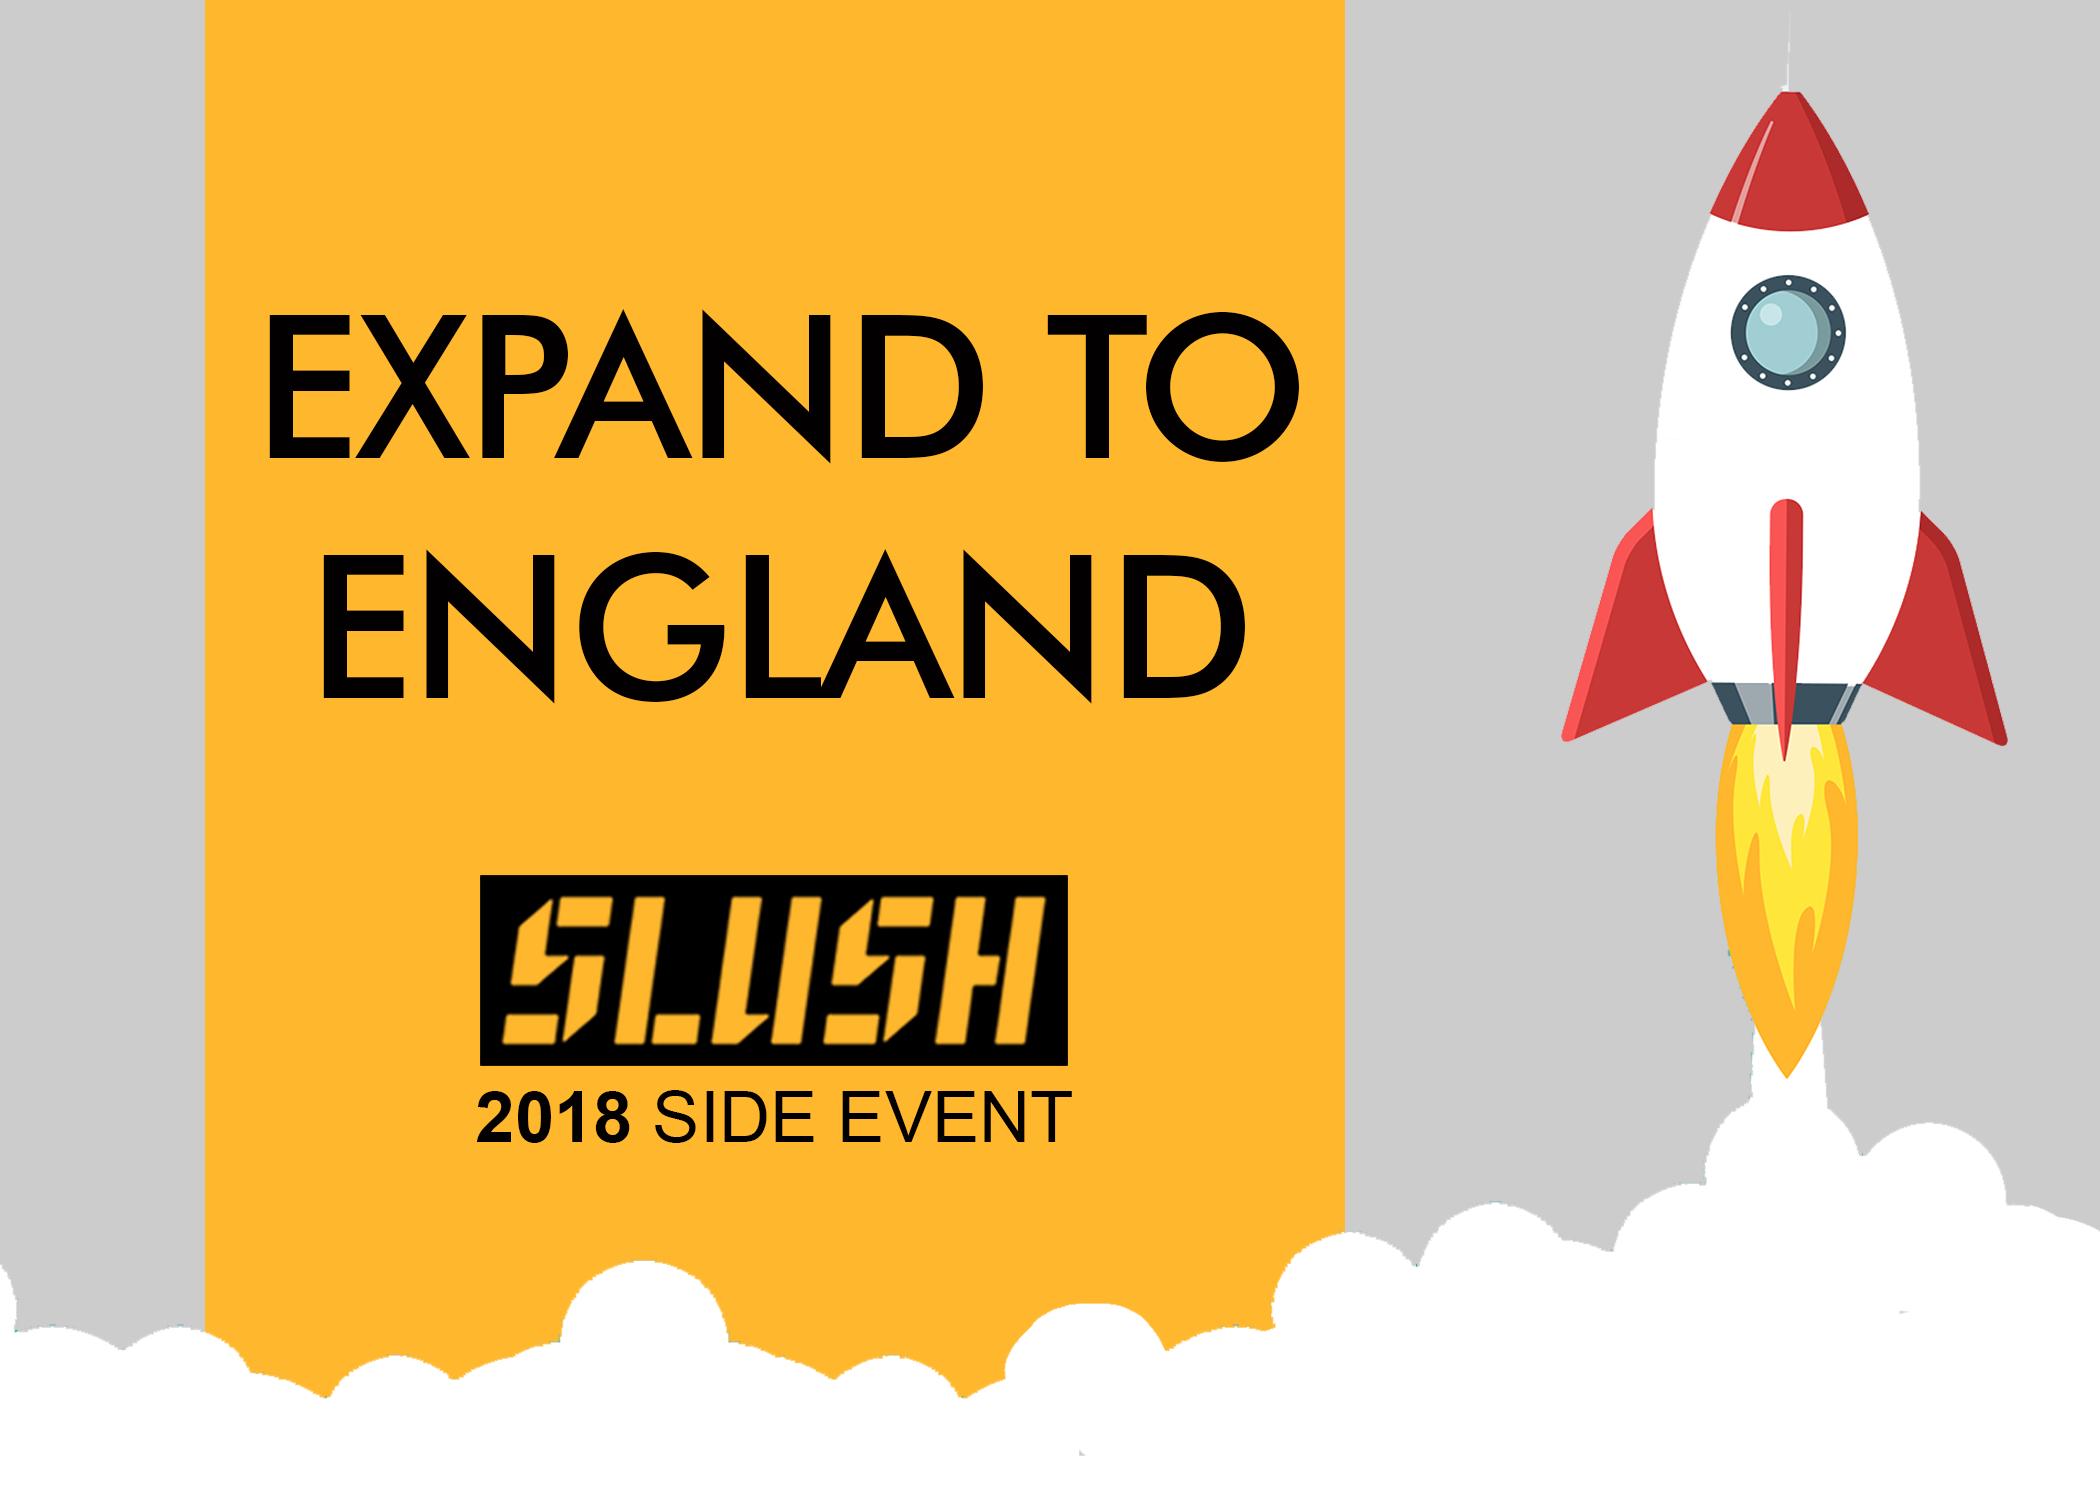 Expand to England - Slush 2018 Goodwille side event logo with rocket